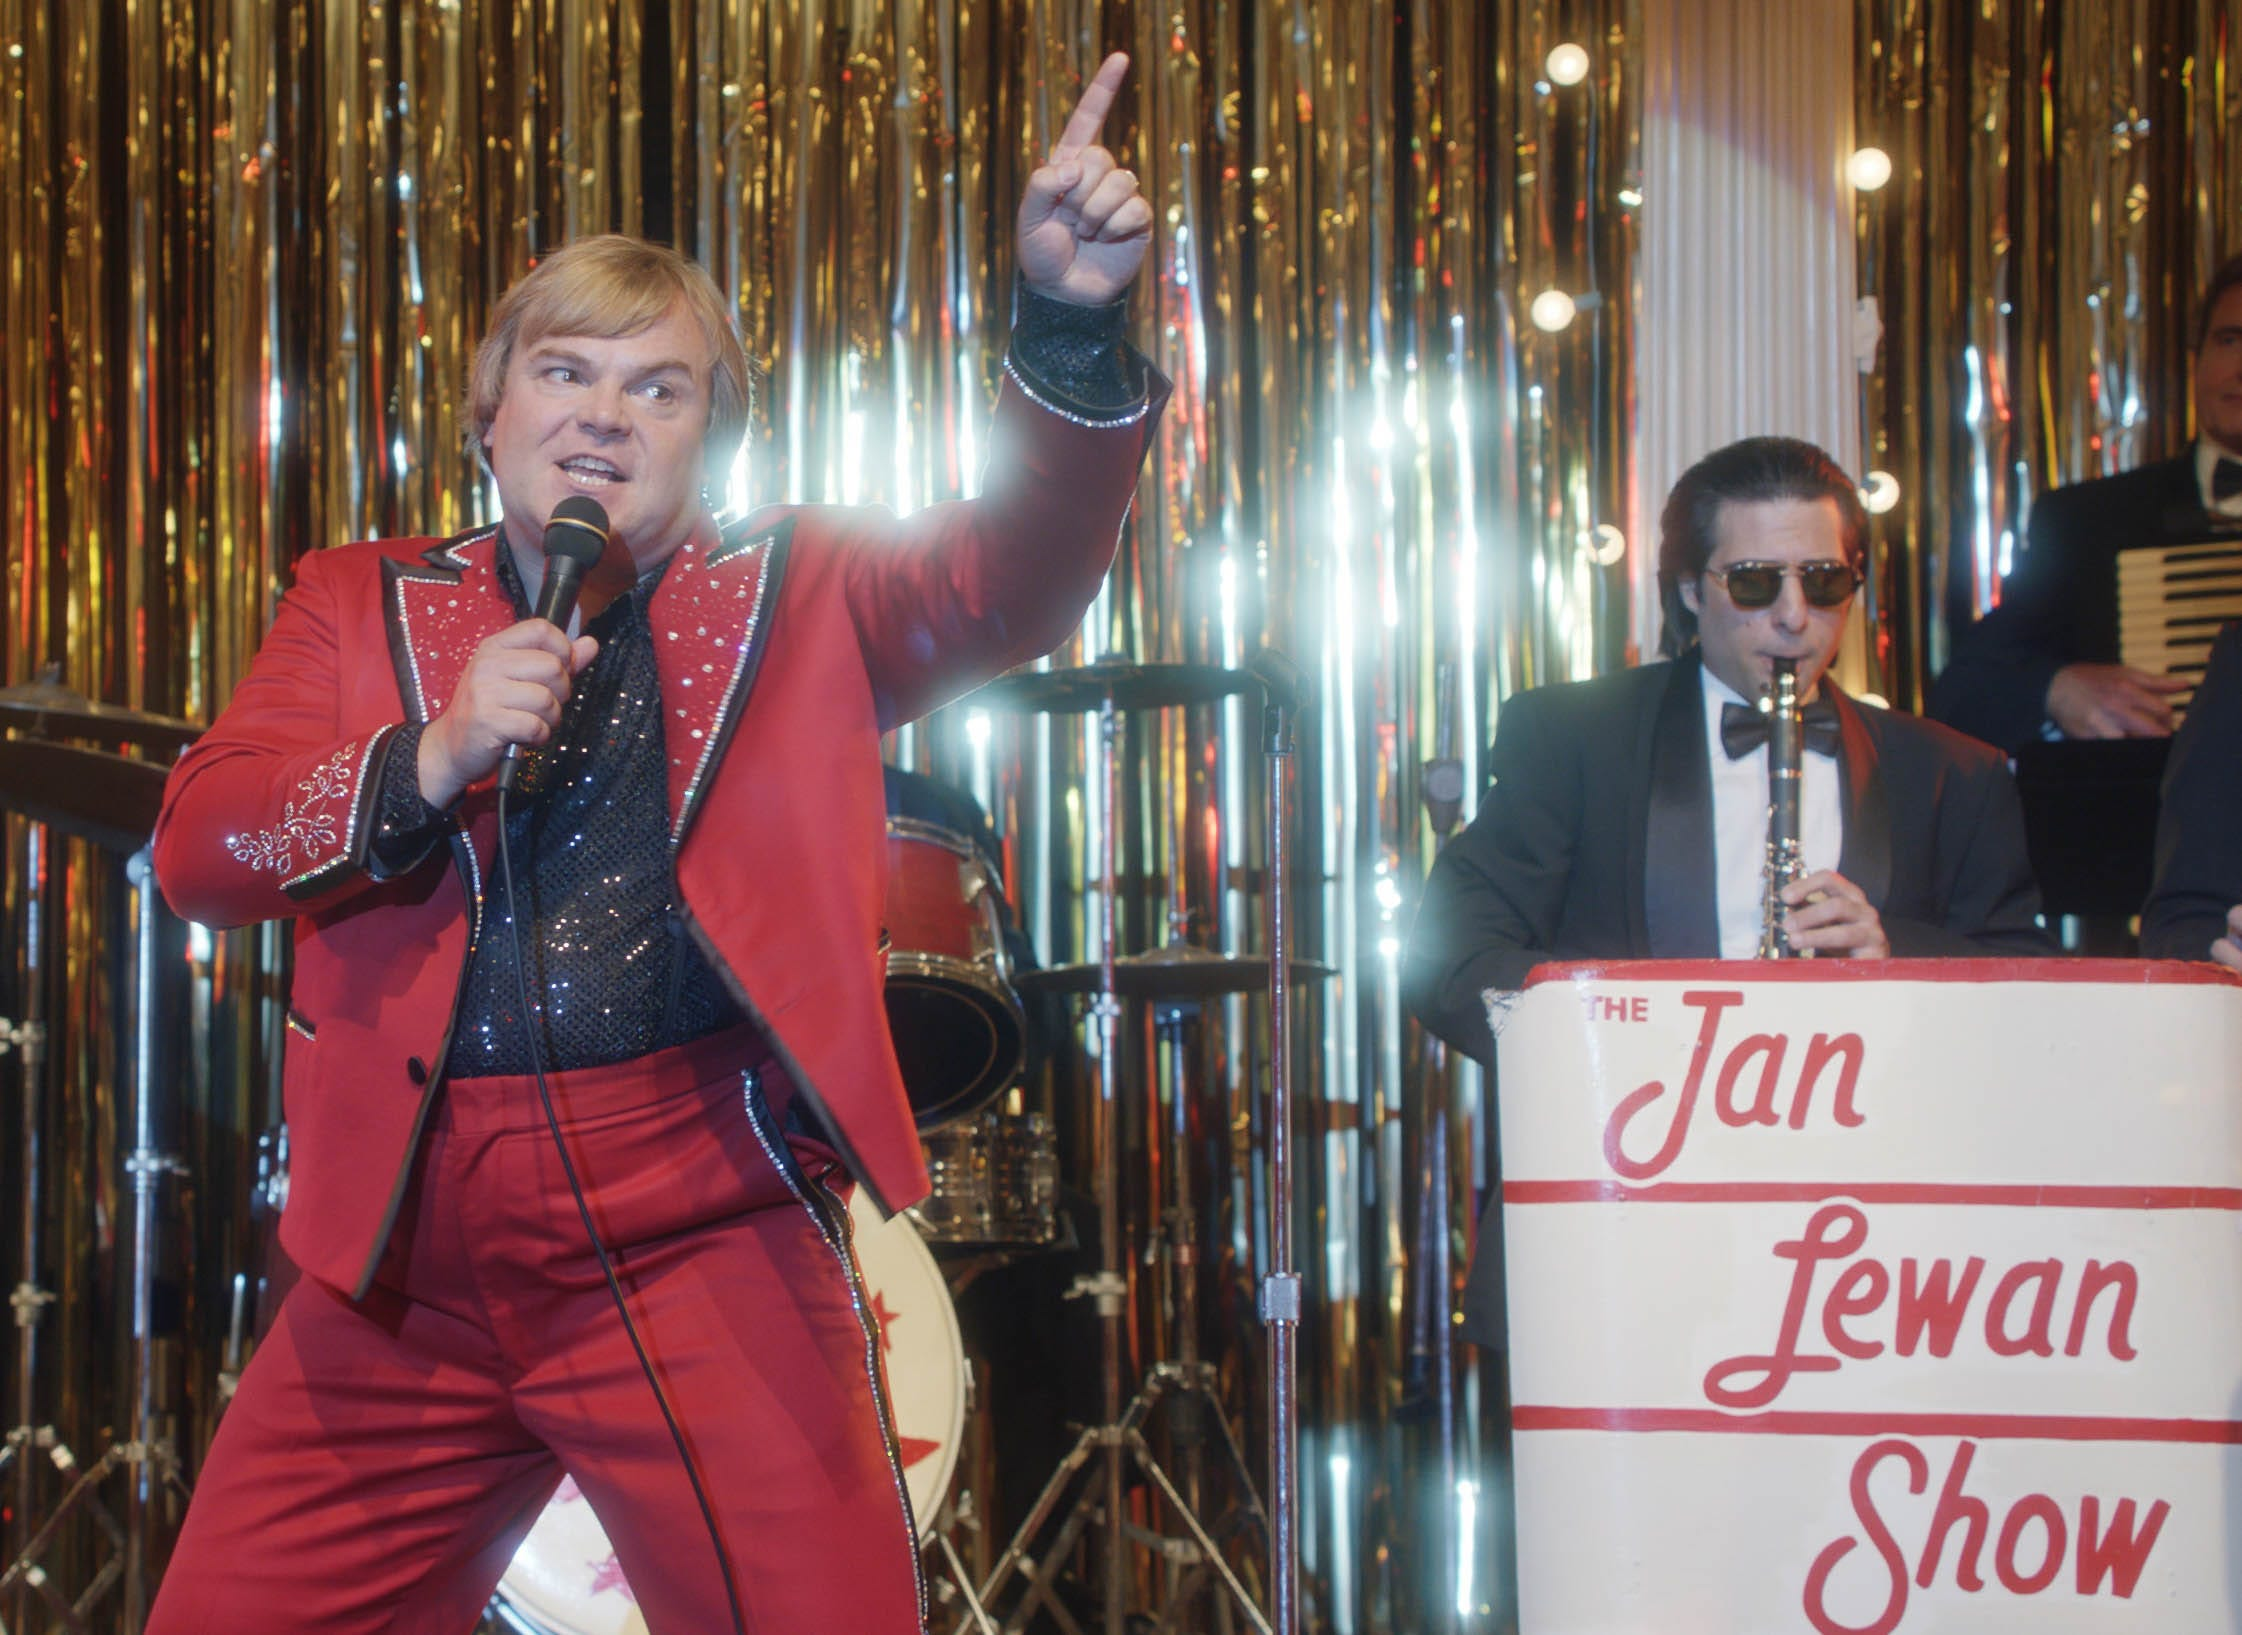 Sundance: Jack Black recruits real-life 'Polka King' for impromptu song